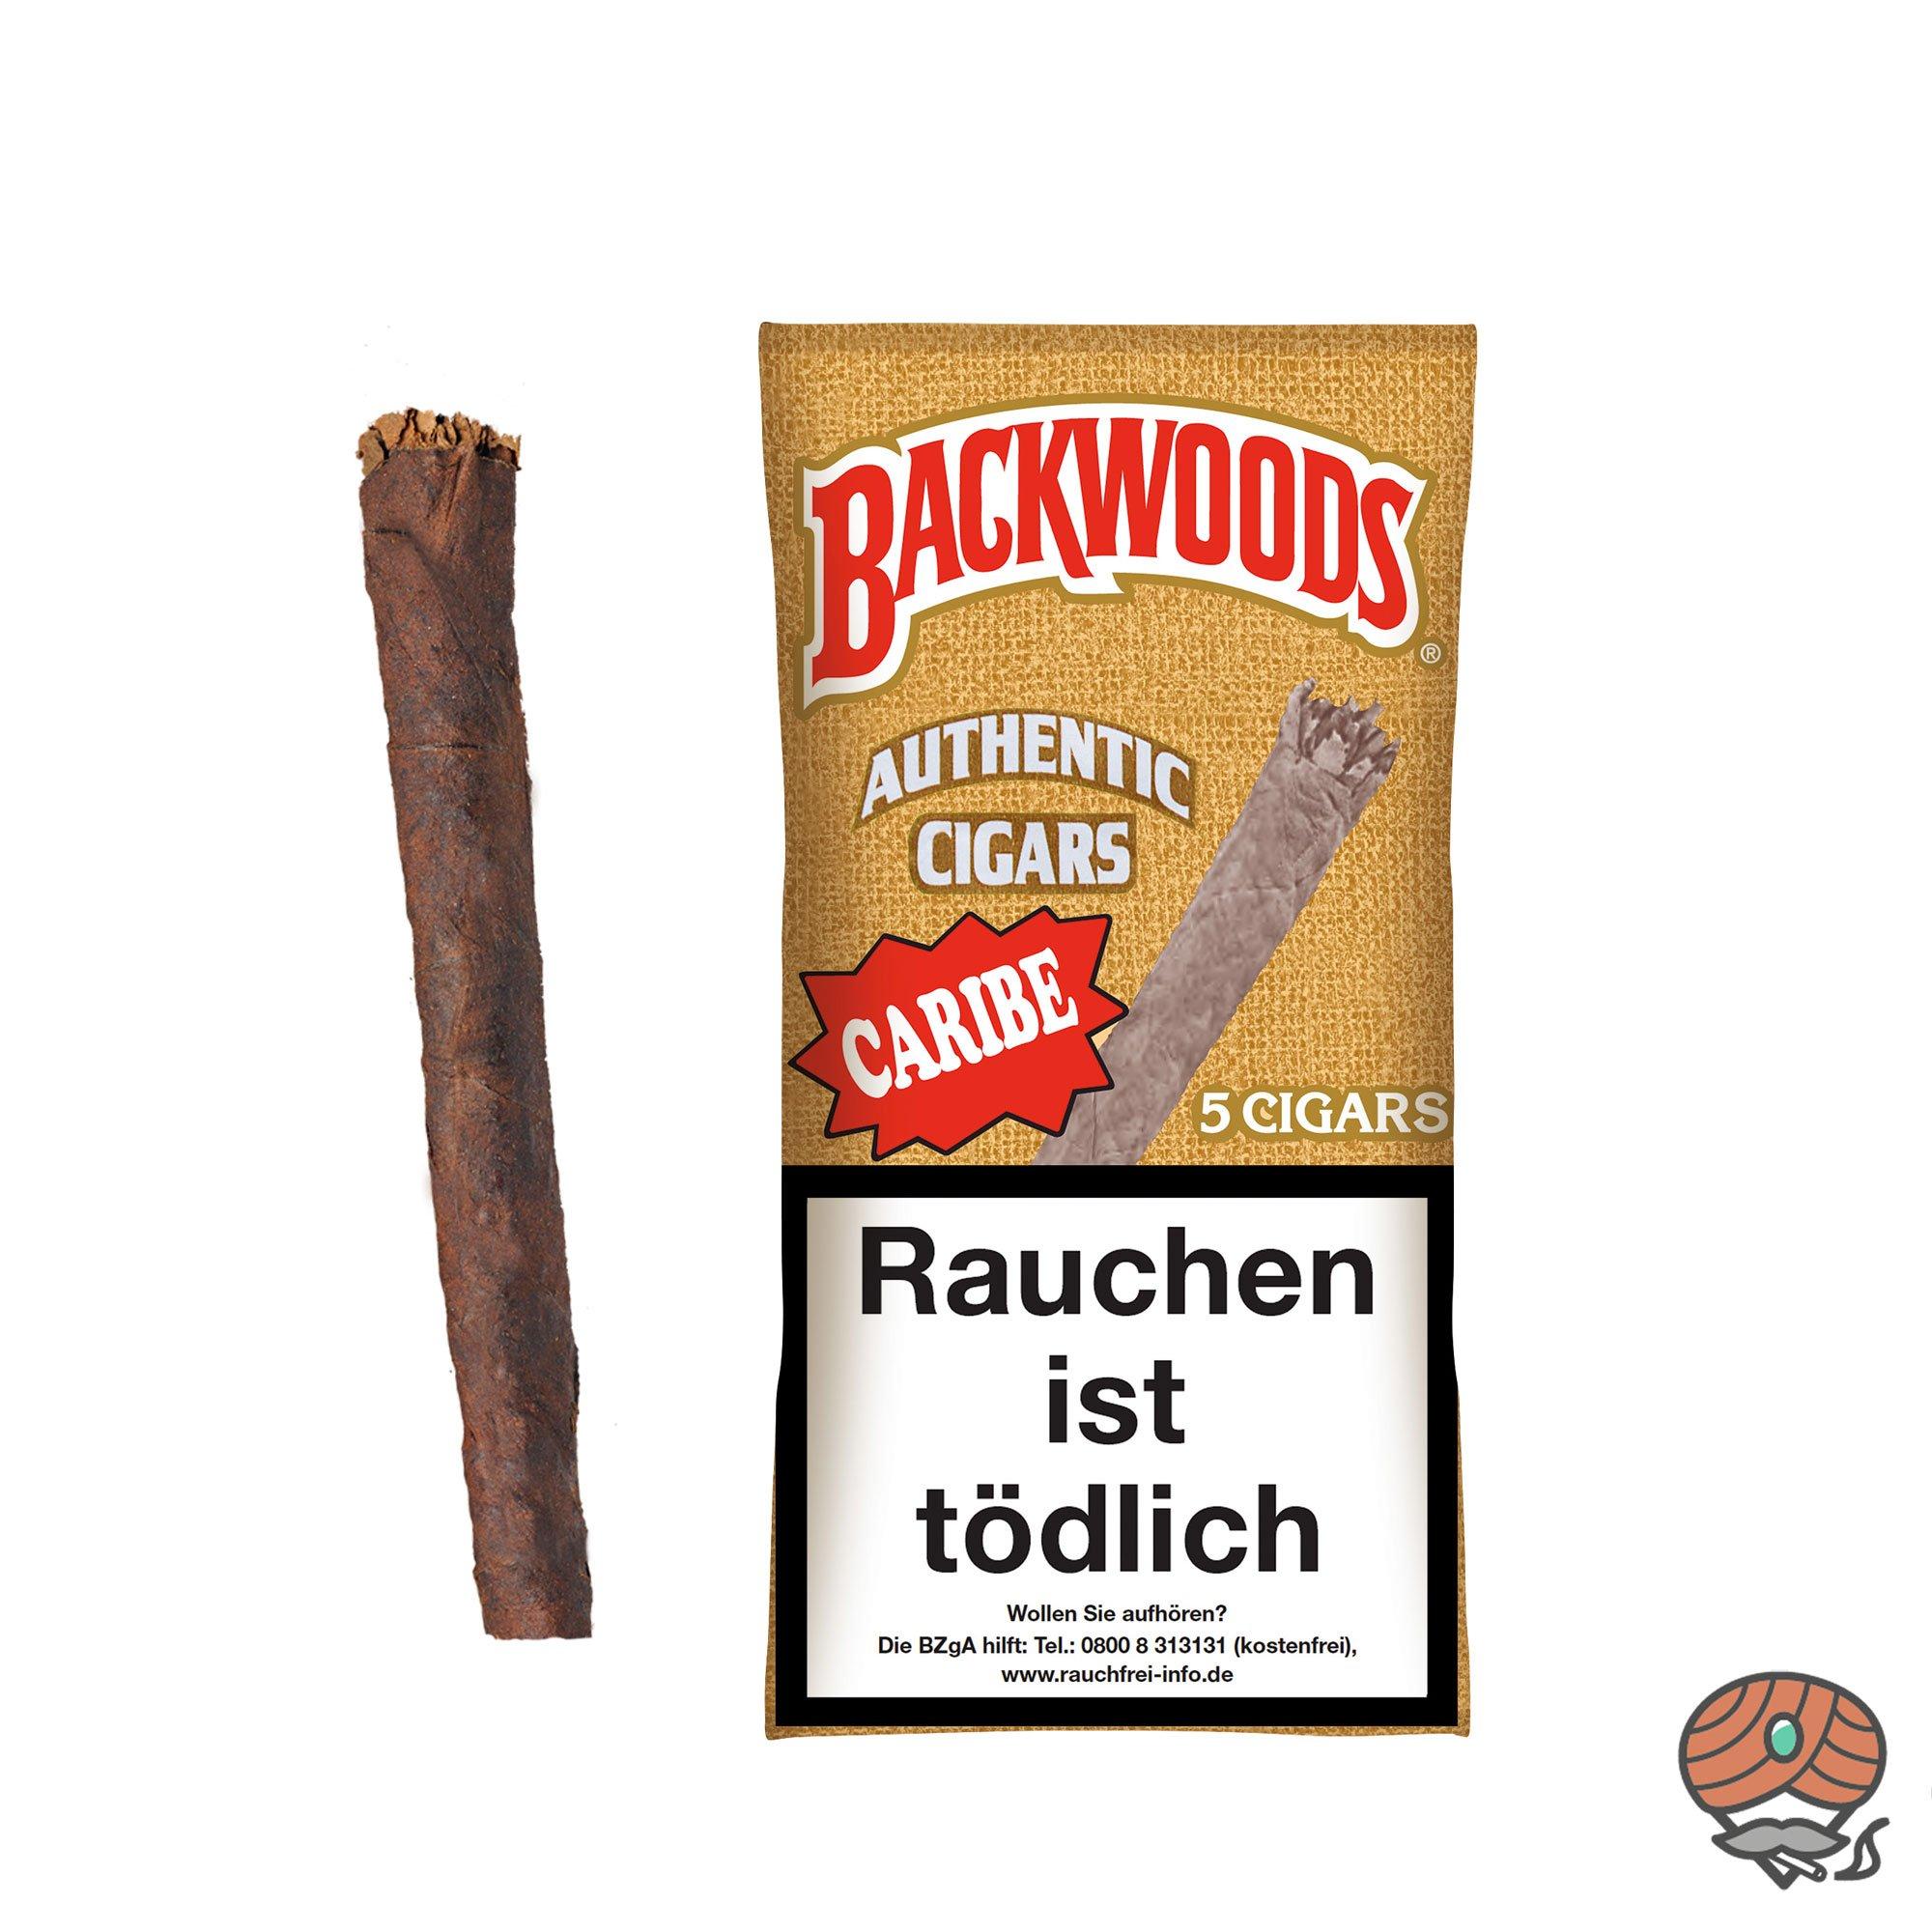 Backwoods Caribe Authentic Cigars 5 Stück 100% Tabak im Humipack